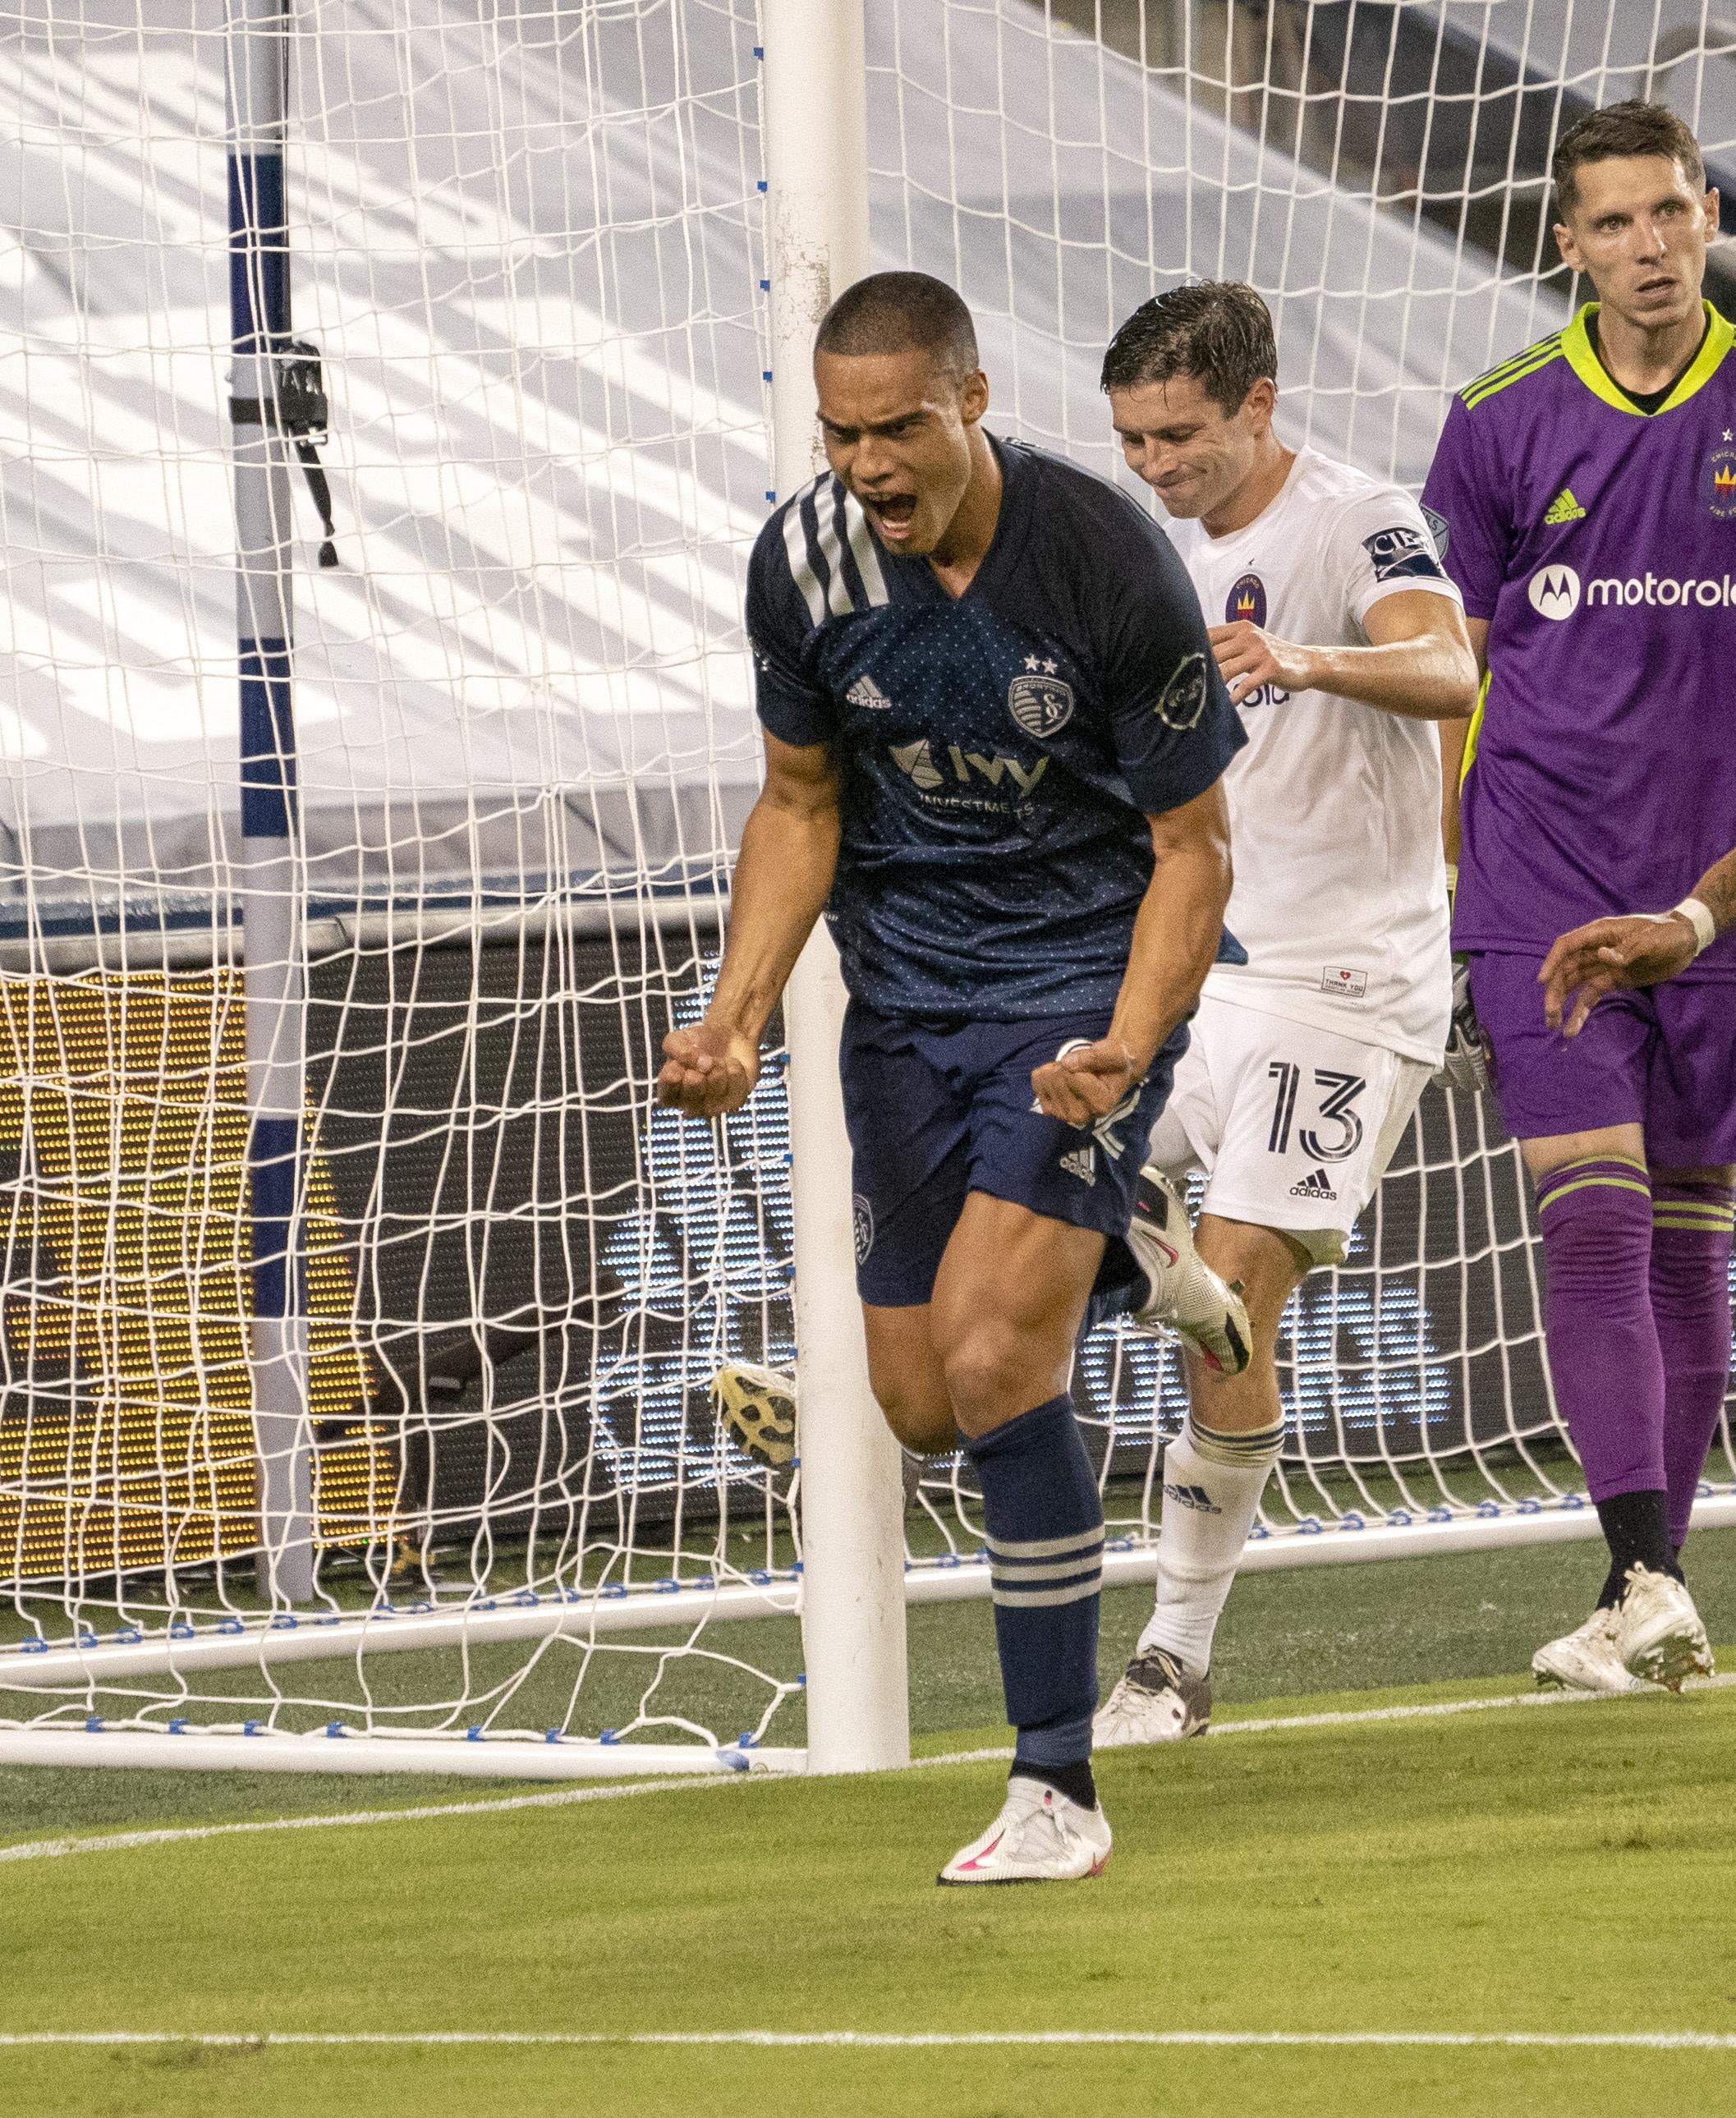 Sporting Kansas City 1, Chicago Fire FC 0 | 2020 MLS Match Recap | MLSSoccer.com